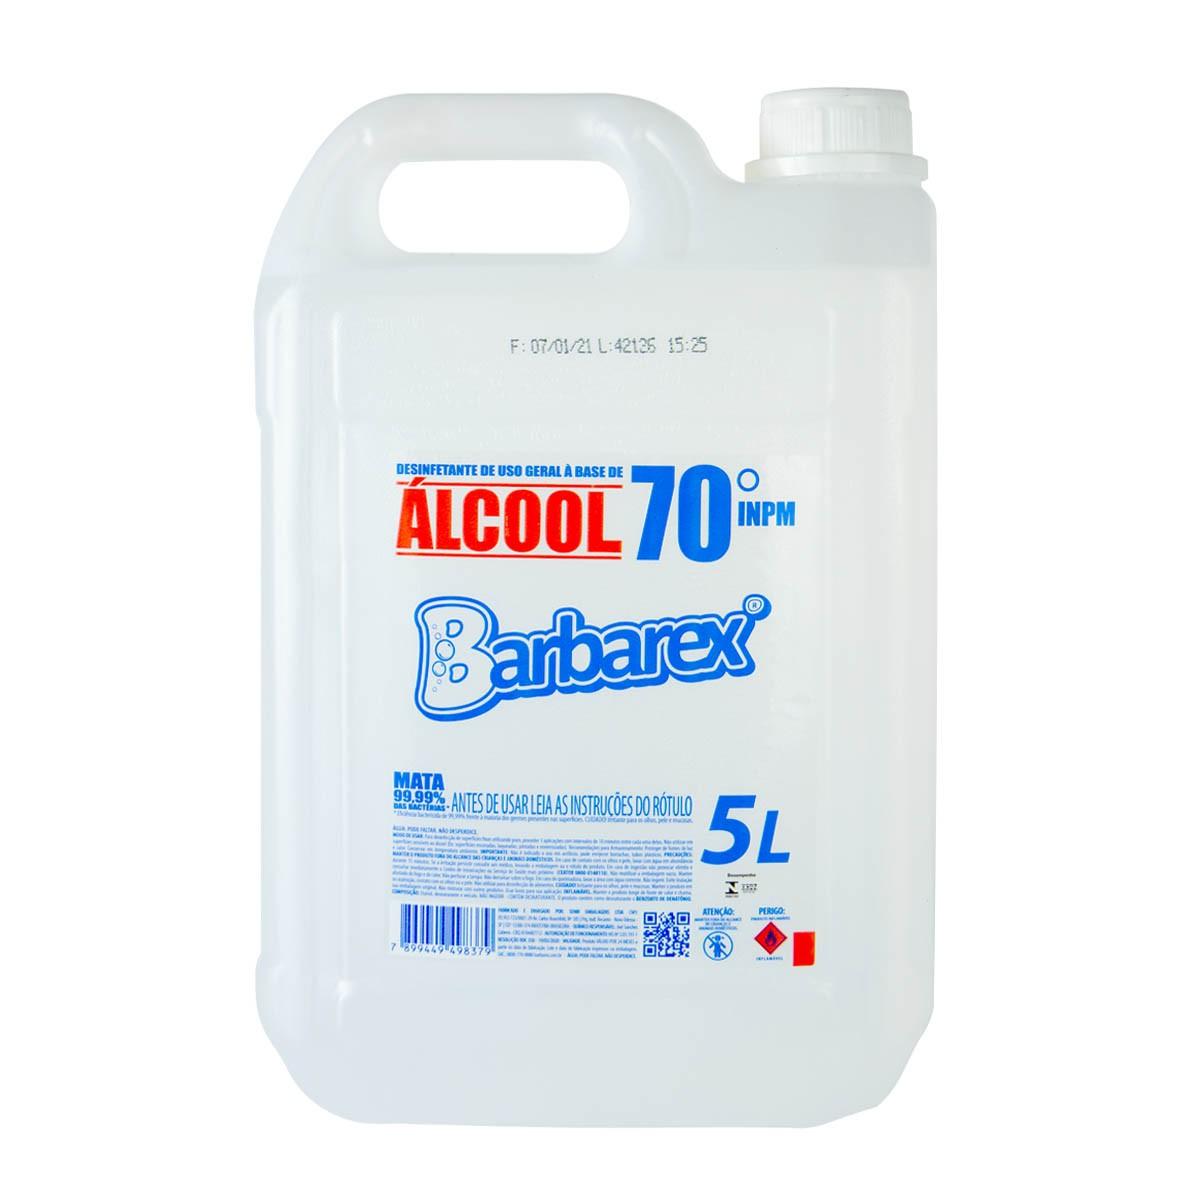 Desinfetante de Uso Geral a Base de Álcool Líquido 70 % INPM Barbarex 5 Litros